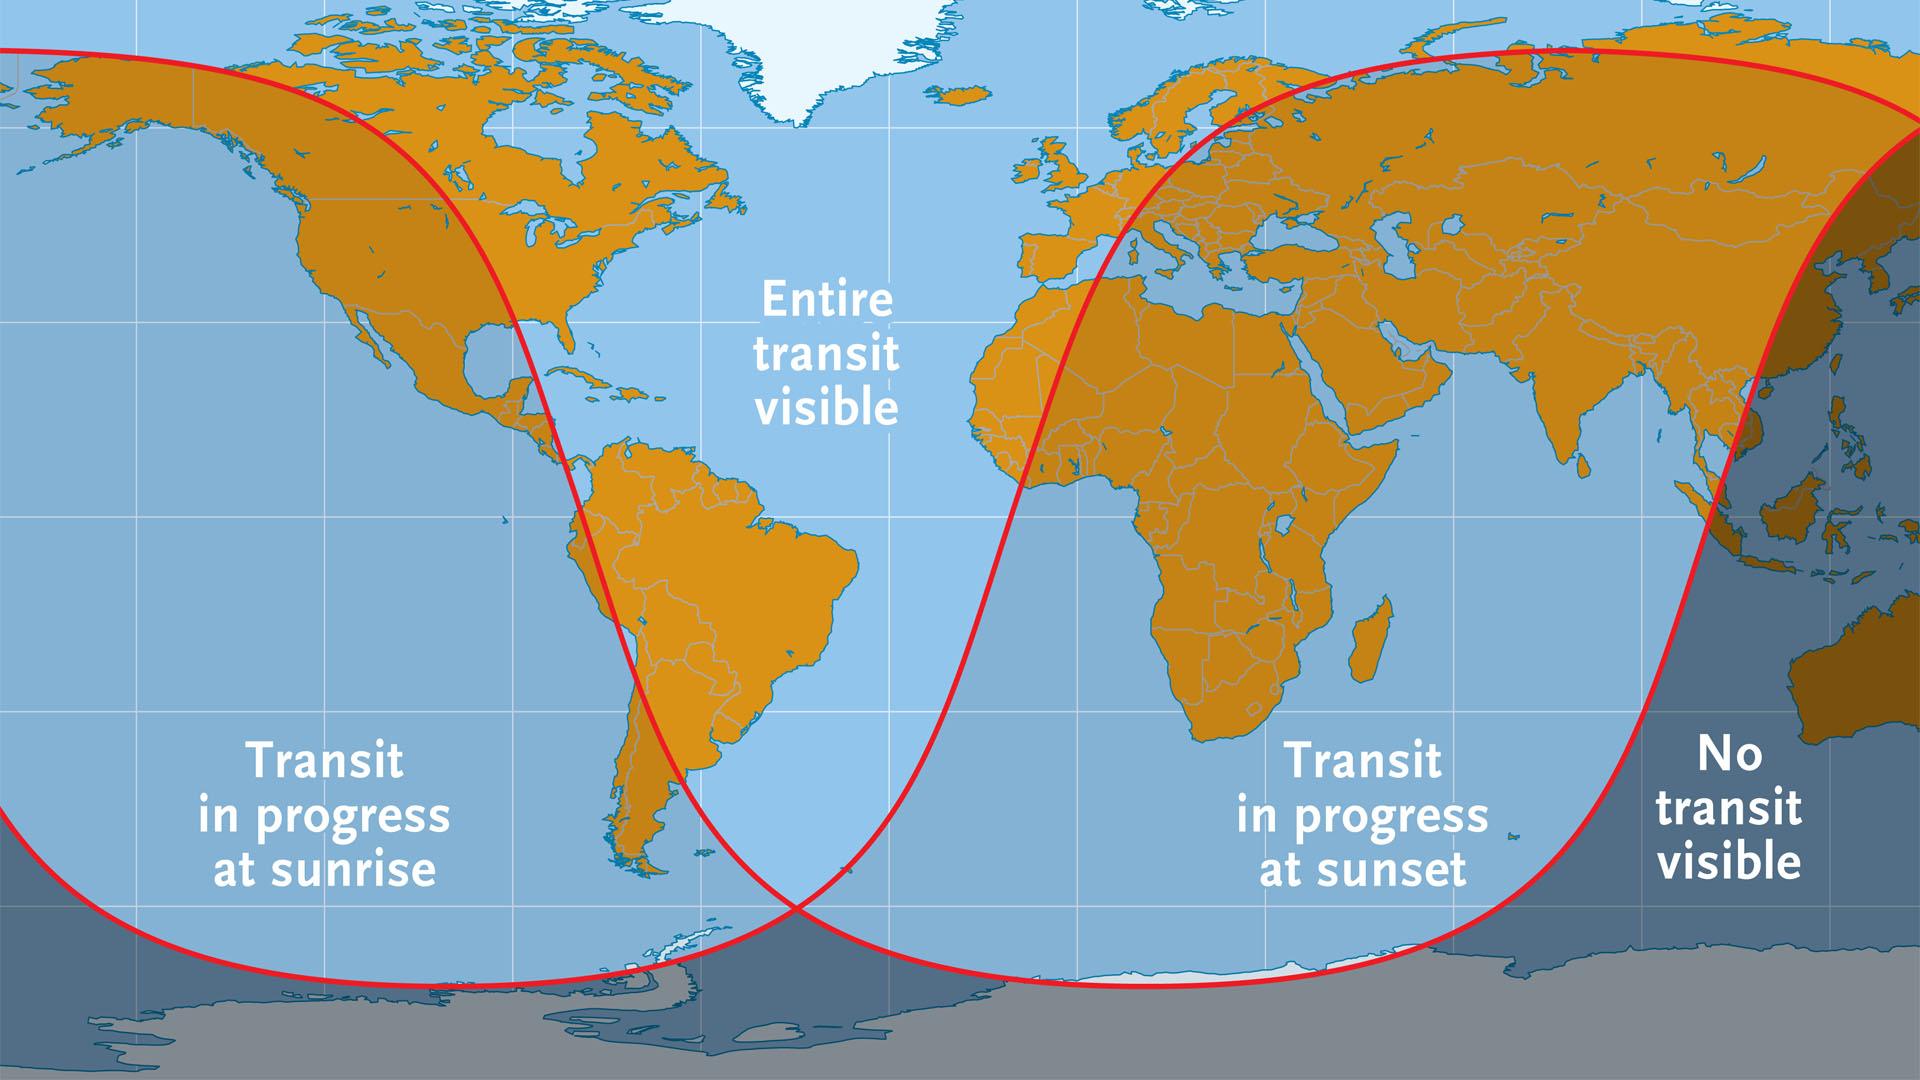 2016 Mercury transit visibility map